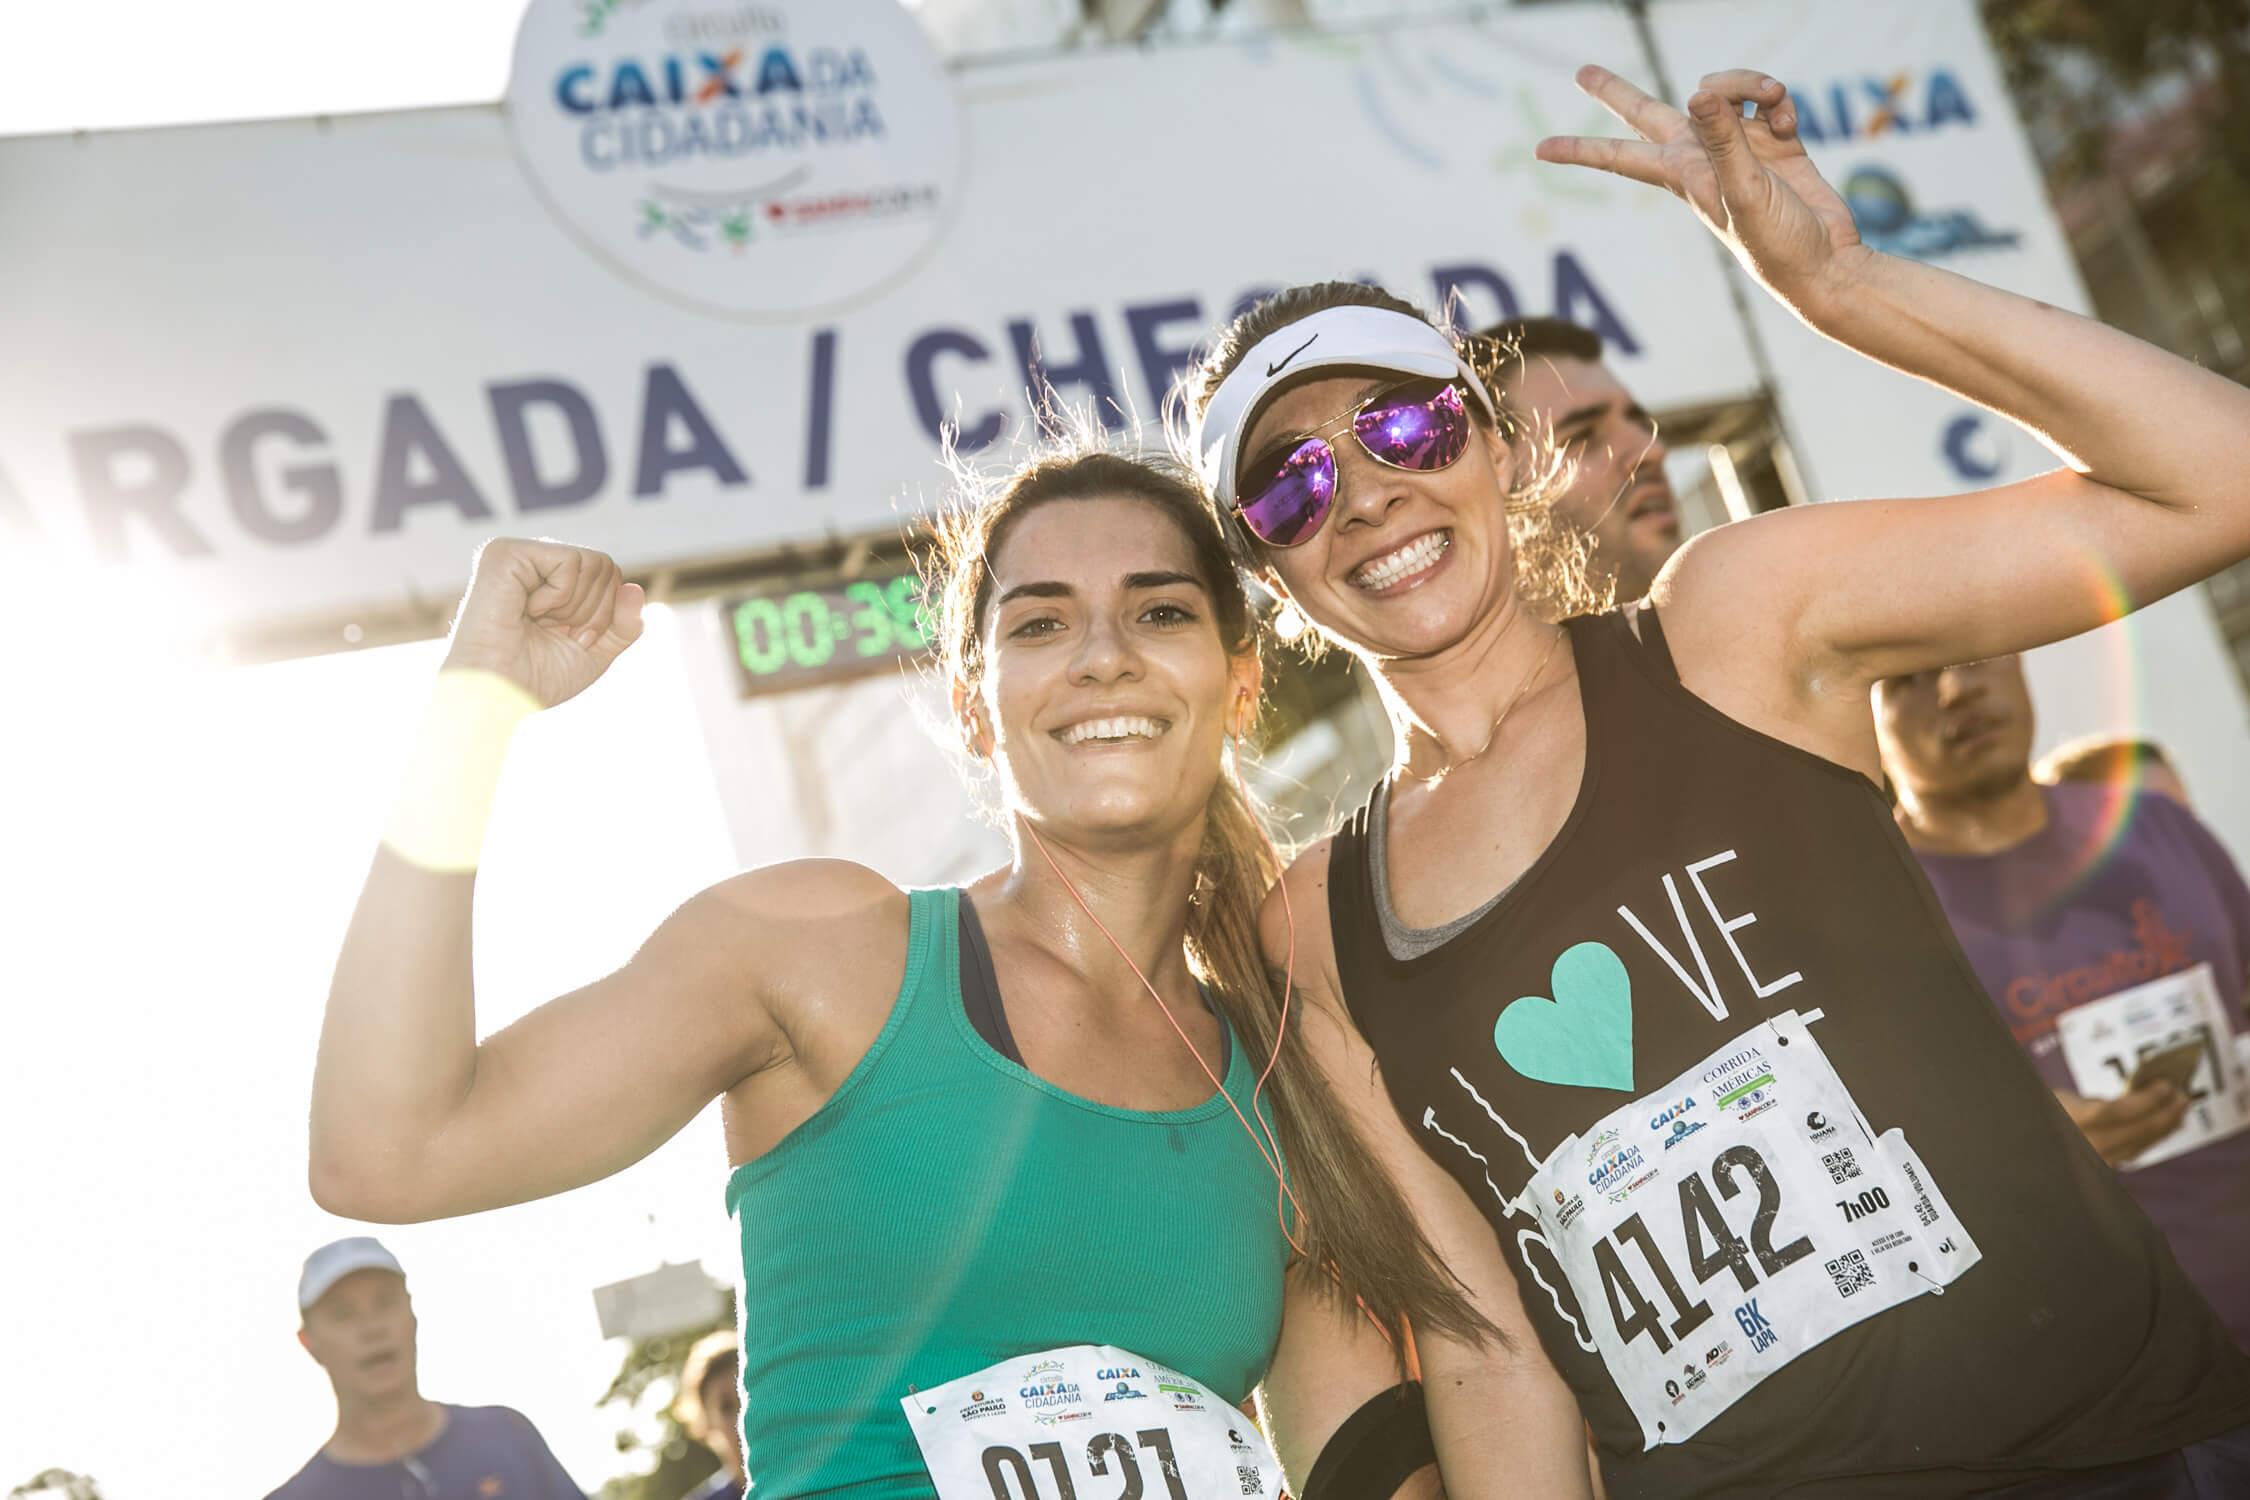 Caixa_da_Cidadanina_Lapa_011